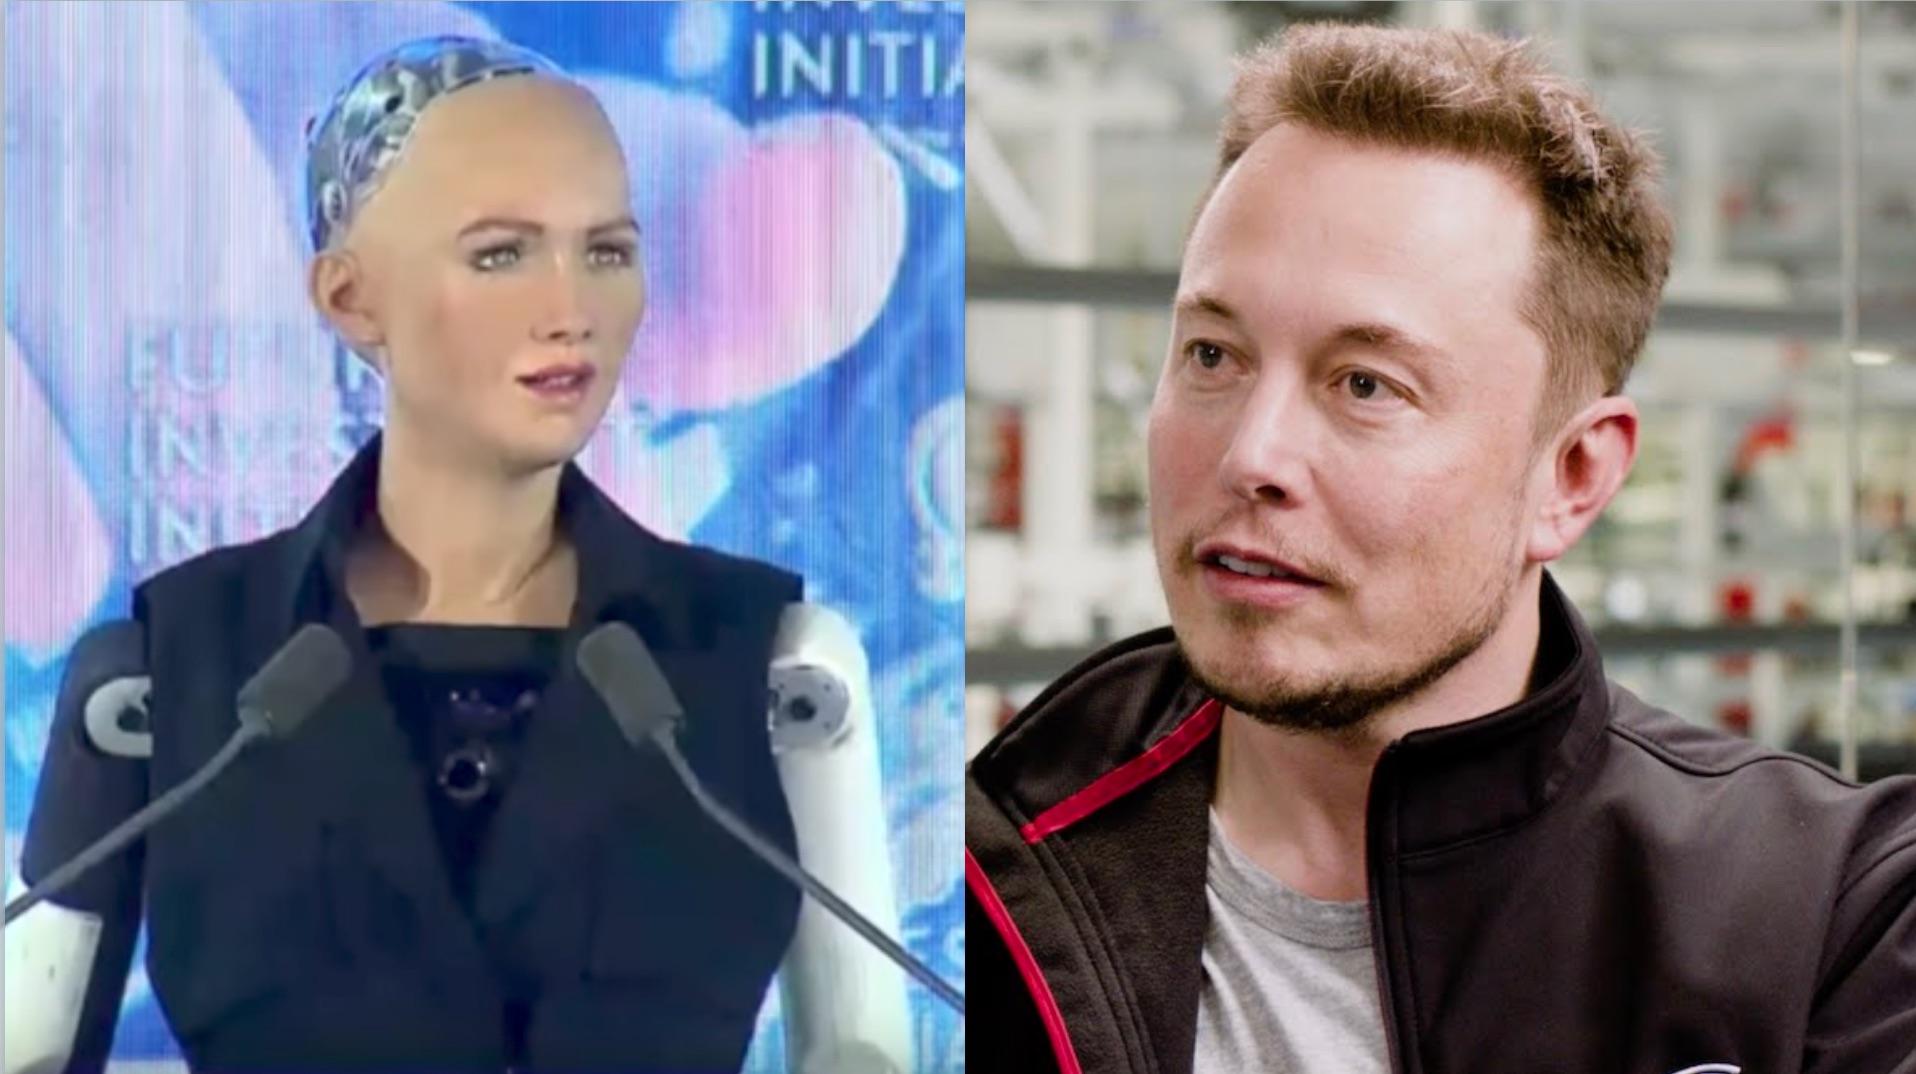 sophia-ai-robot-vs-elon-musk